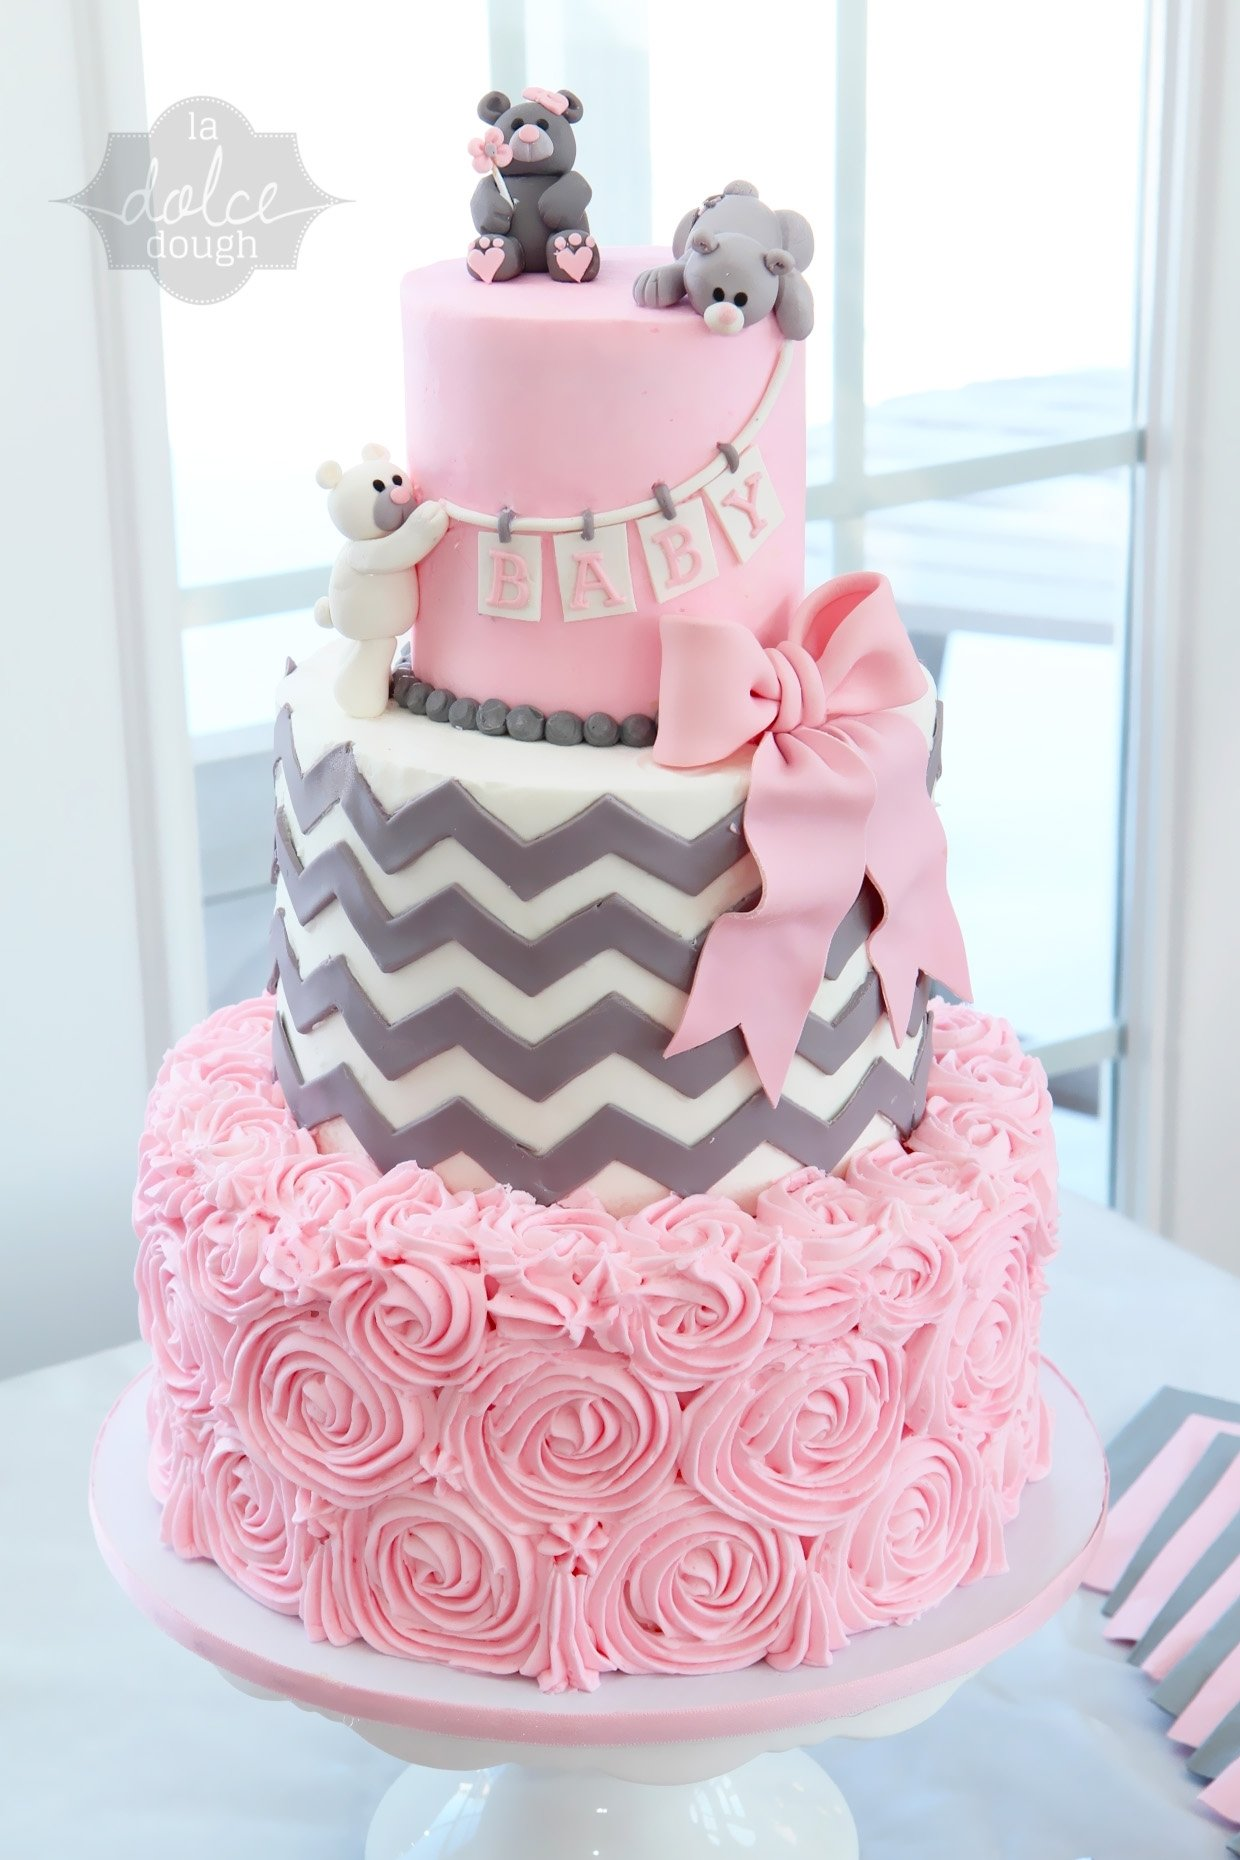 10 Stunning Baby Shower Cake Ideas For A Girl baby shower cake ideas for girl ba cakes you can look easy 736x736 2021